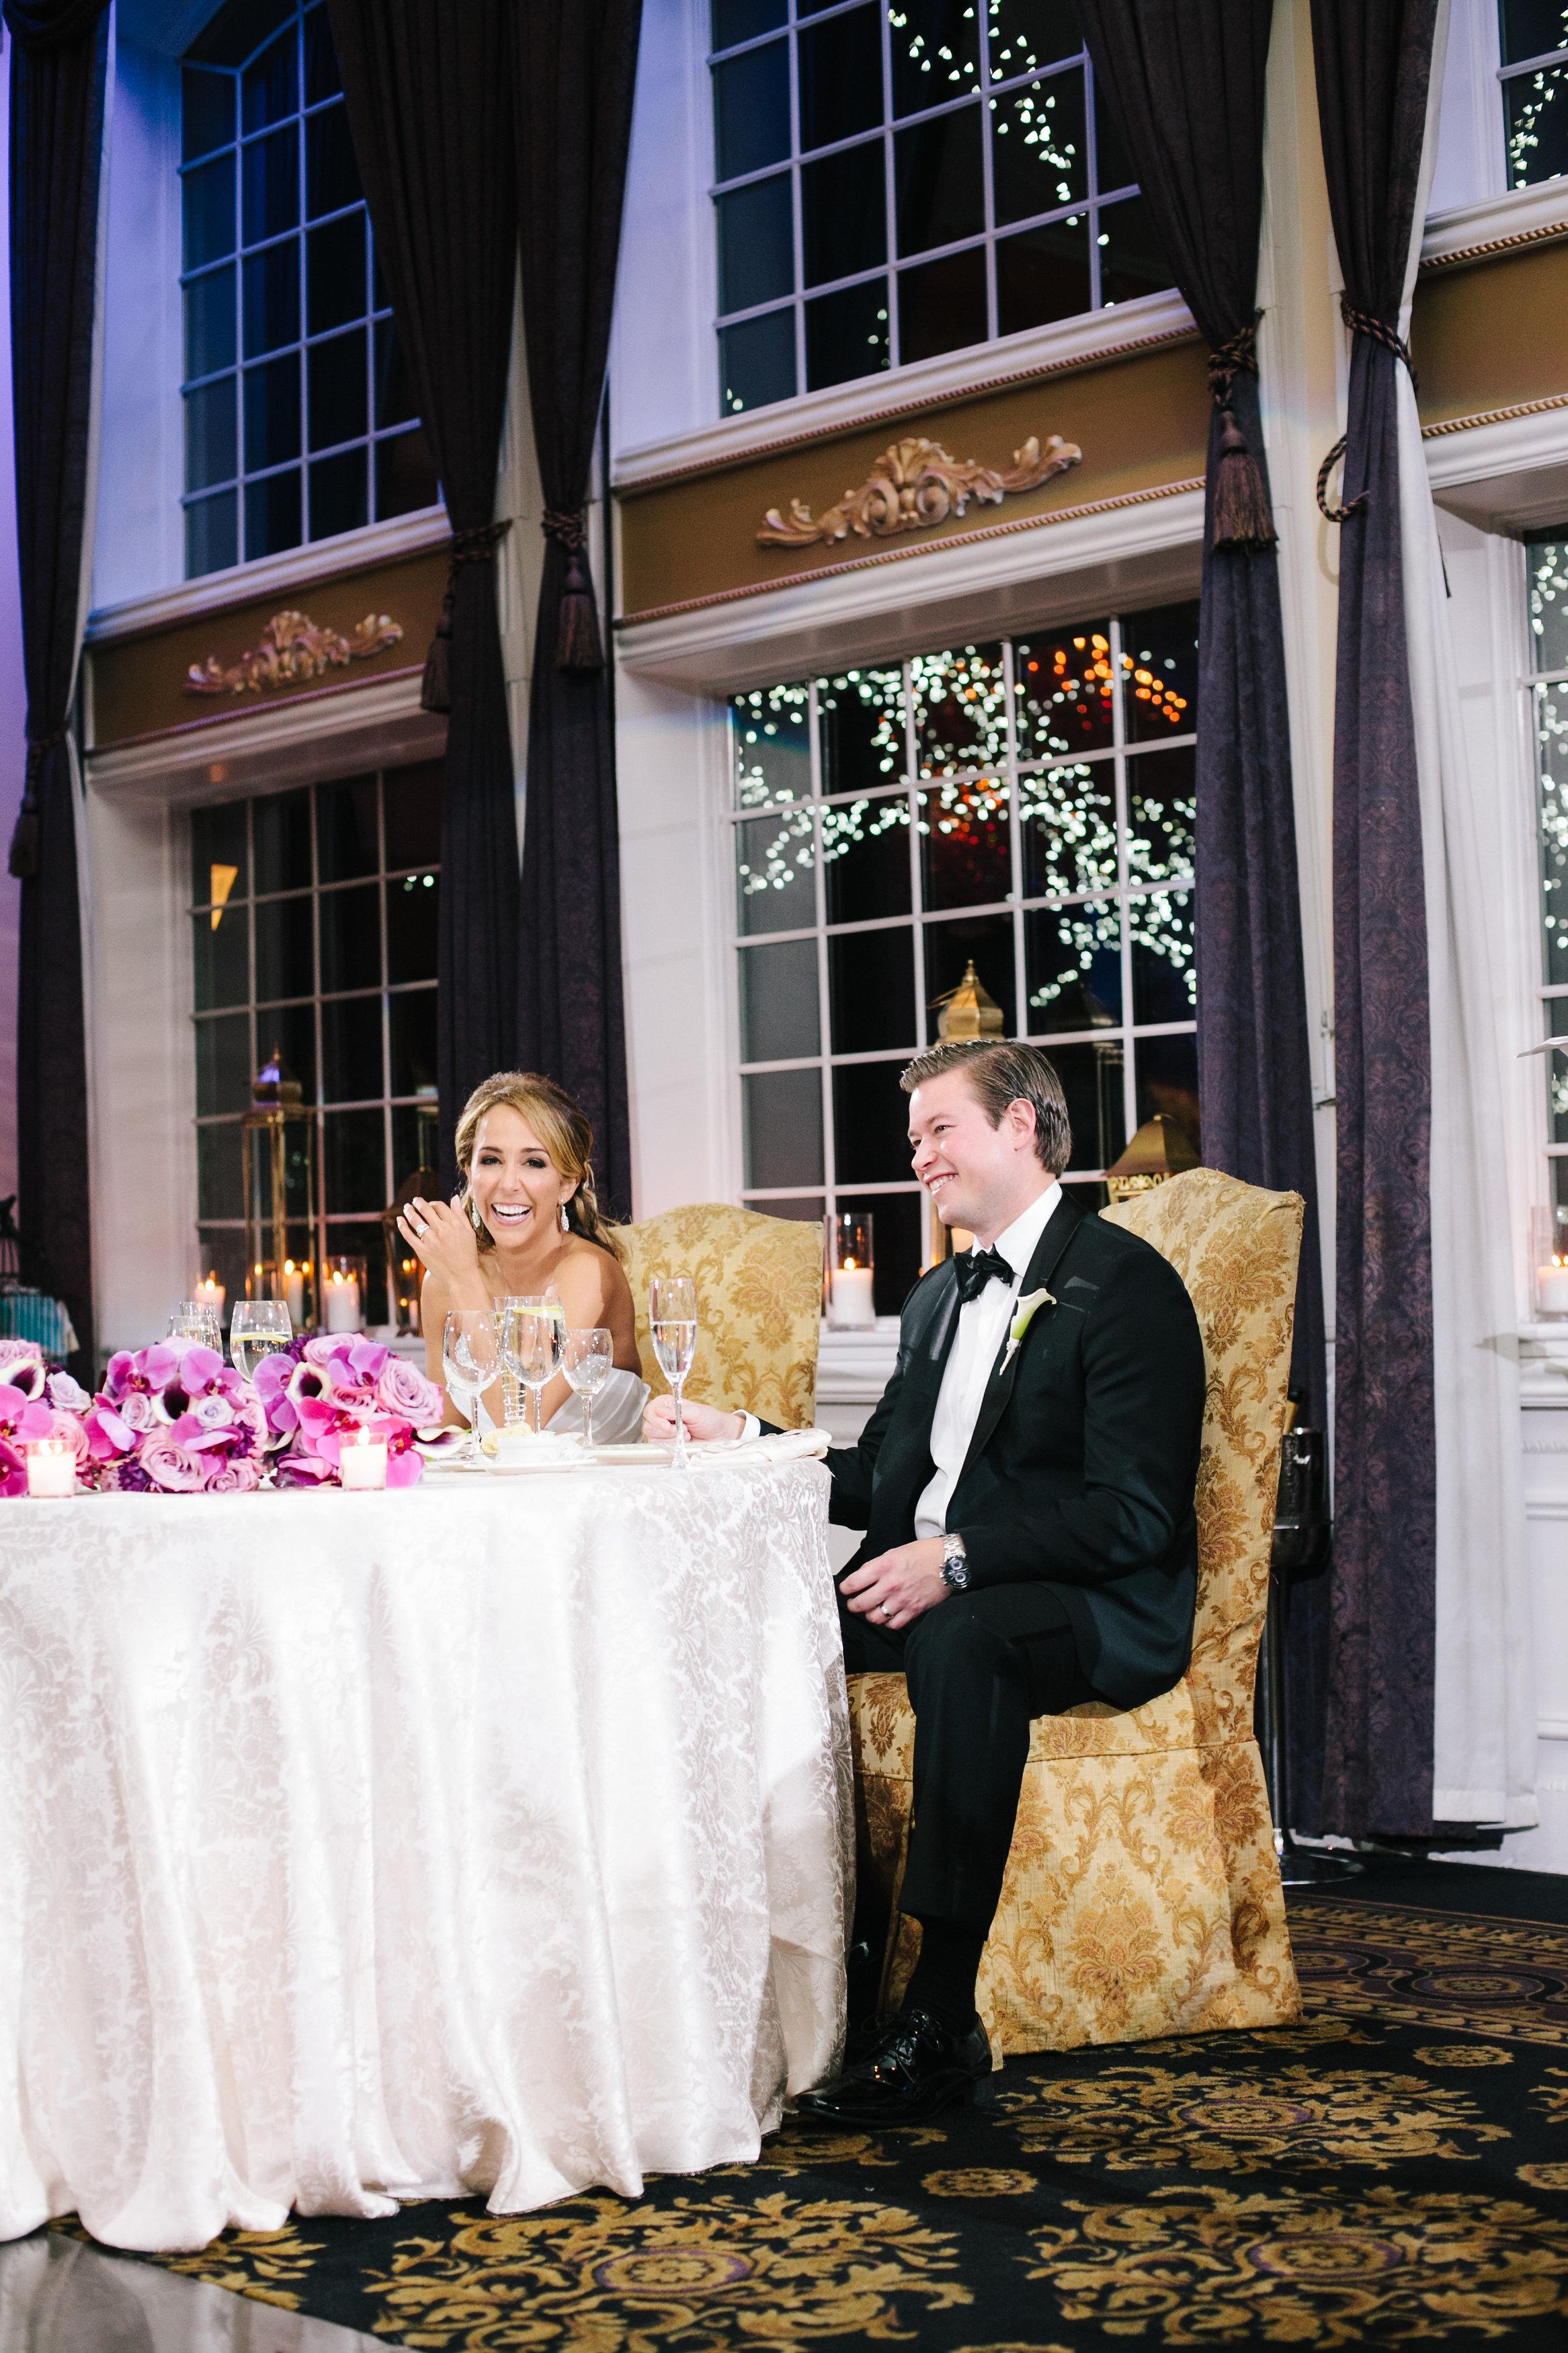 Ceci_New_York_Custom_Invitation_ New_Jersey_Wedding_Luxury_Personalized_Ceci_Style_Bride_Foil_Stamping164.JPG